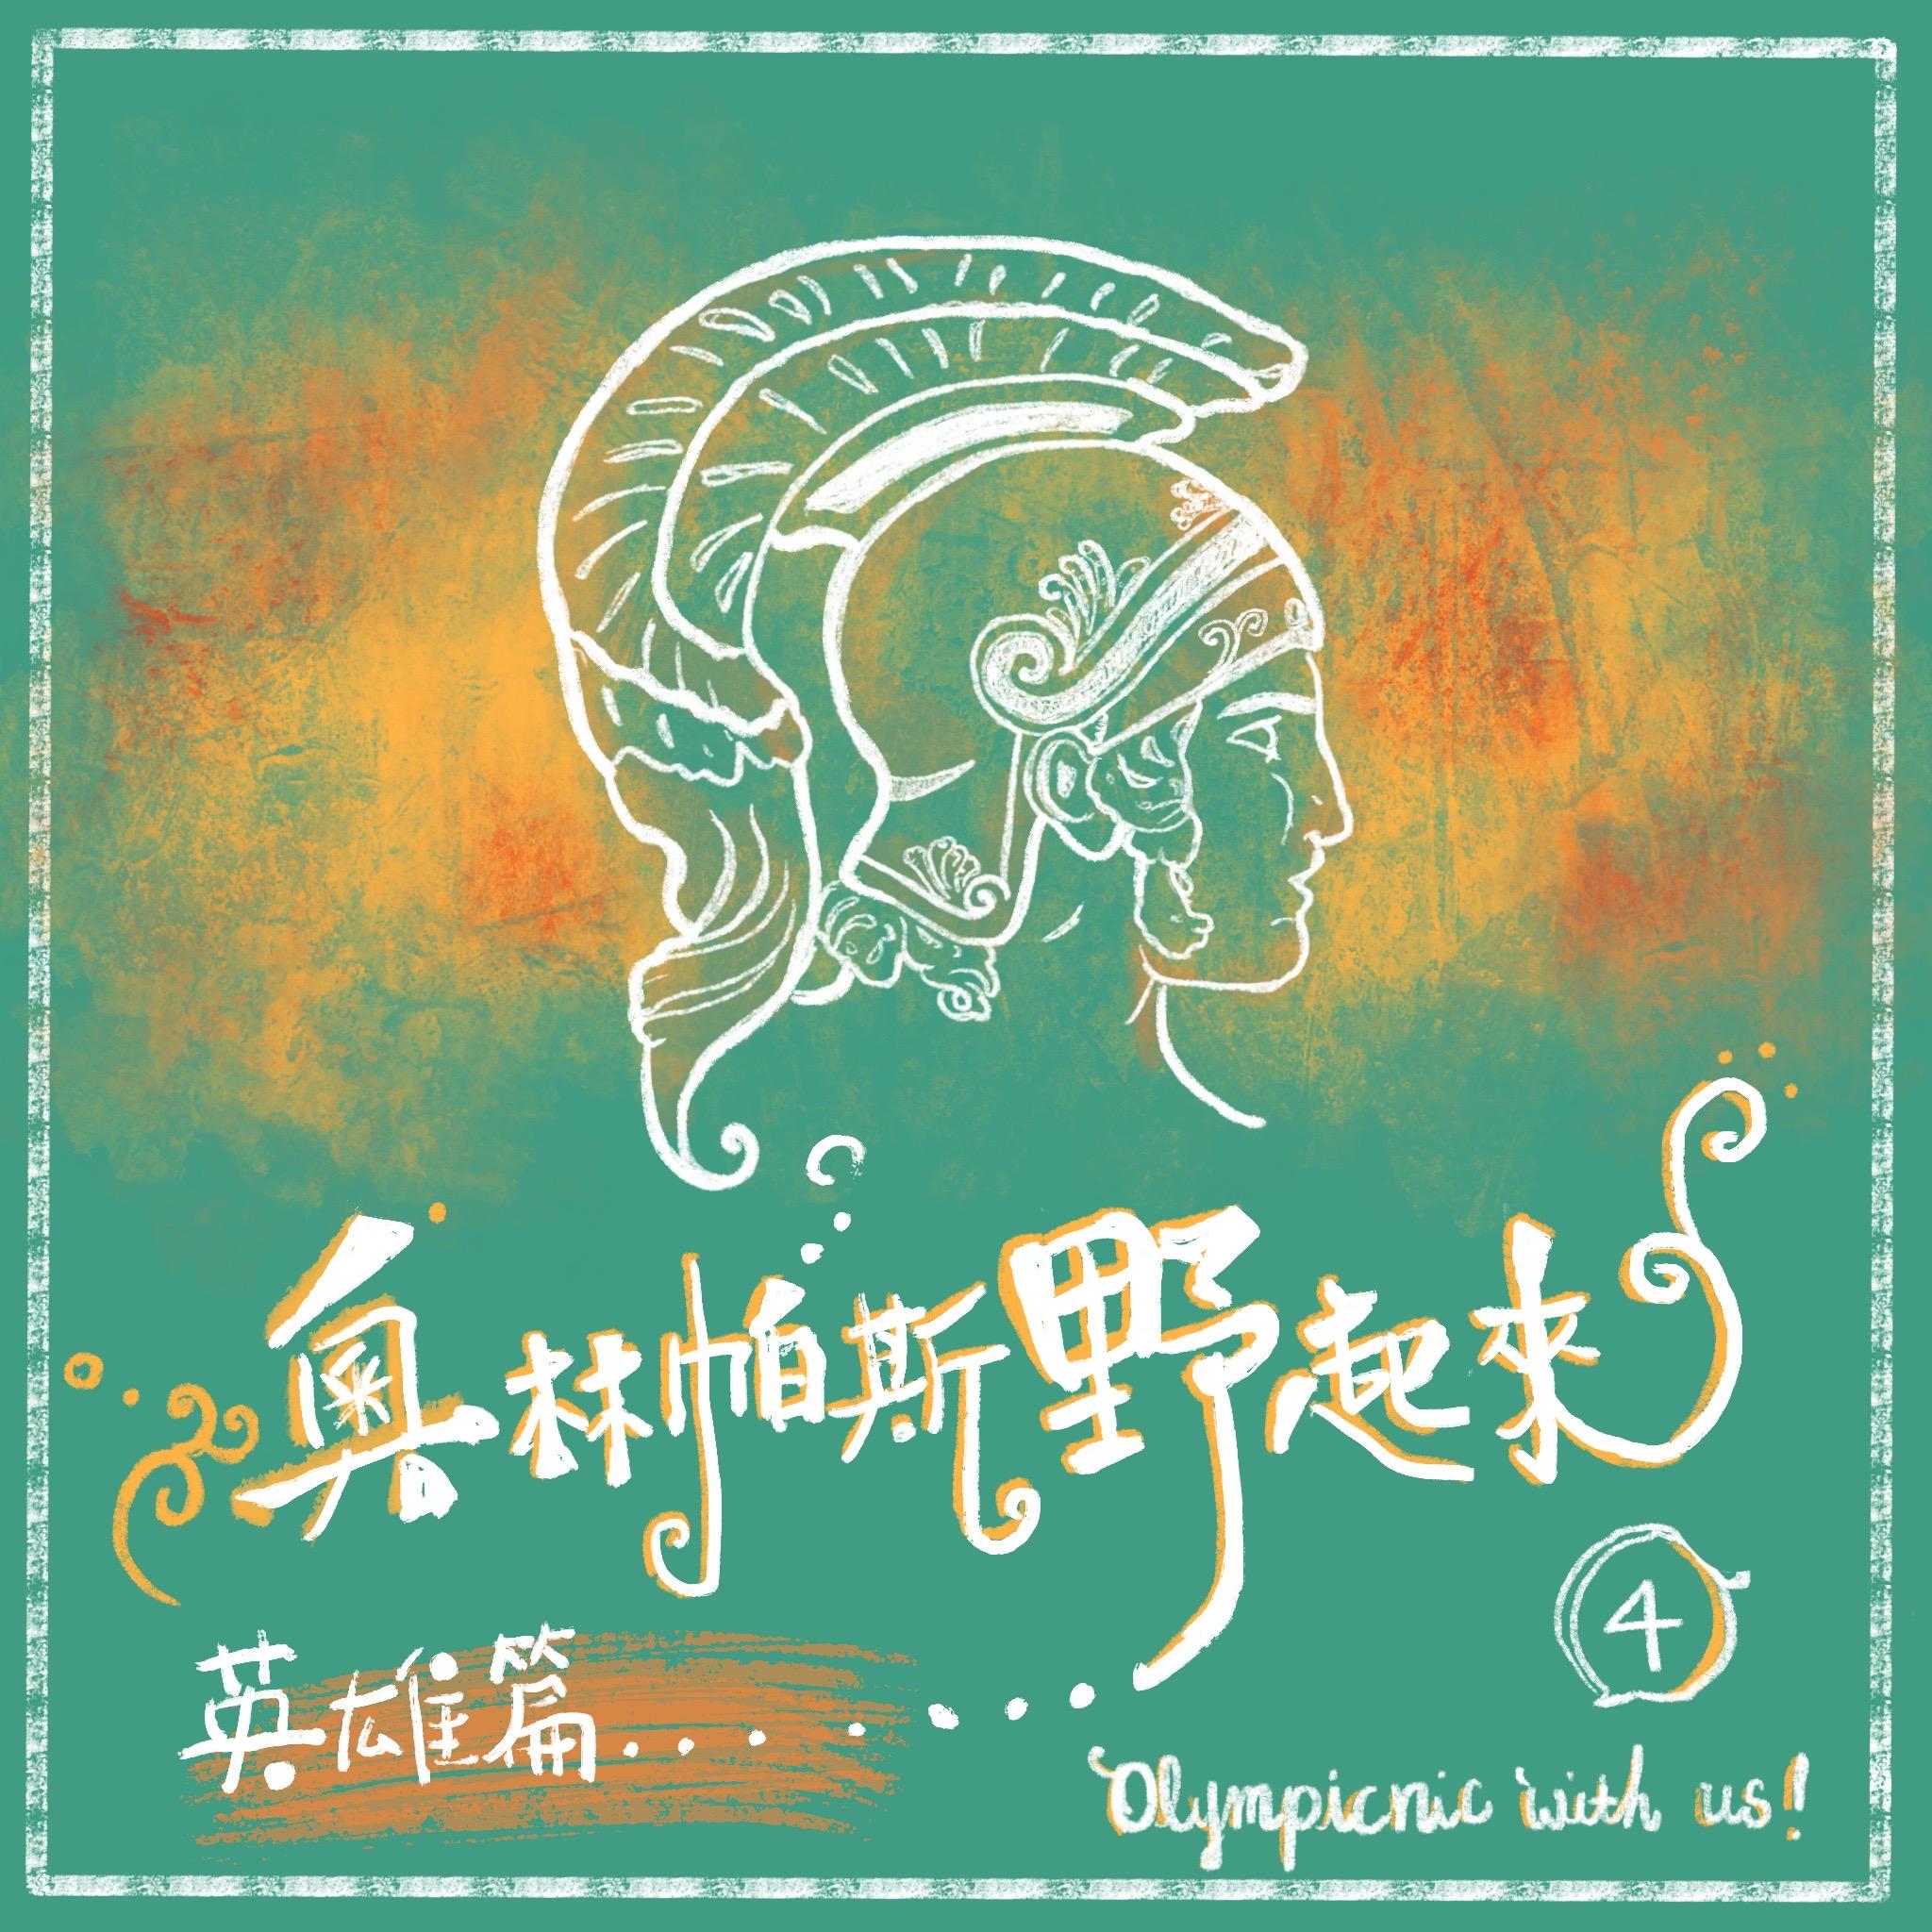 ep.4奧林帕斯野起來 Olympicnic with us(英雄篇)